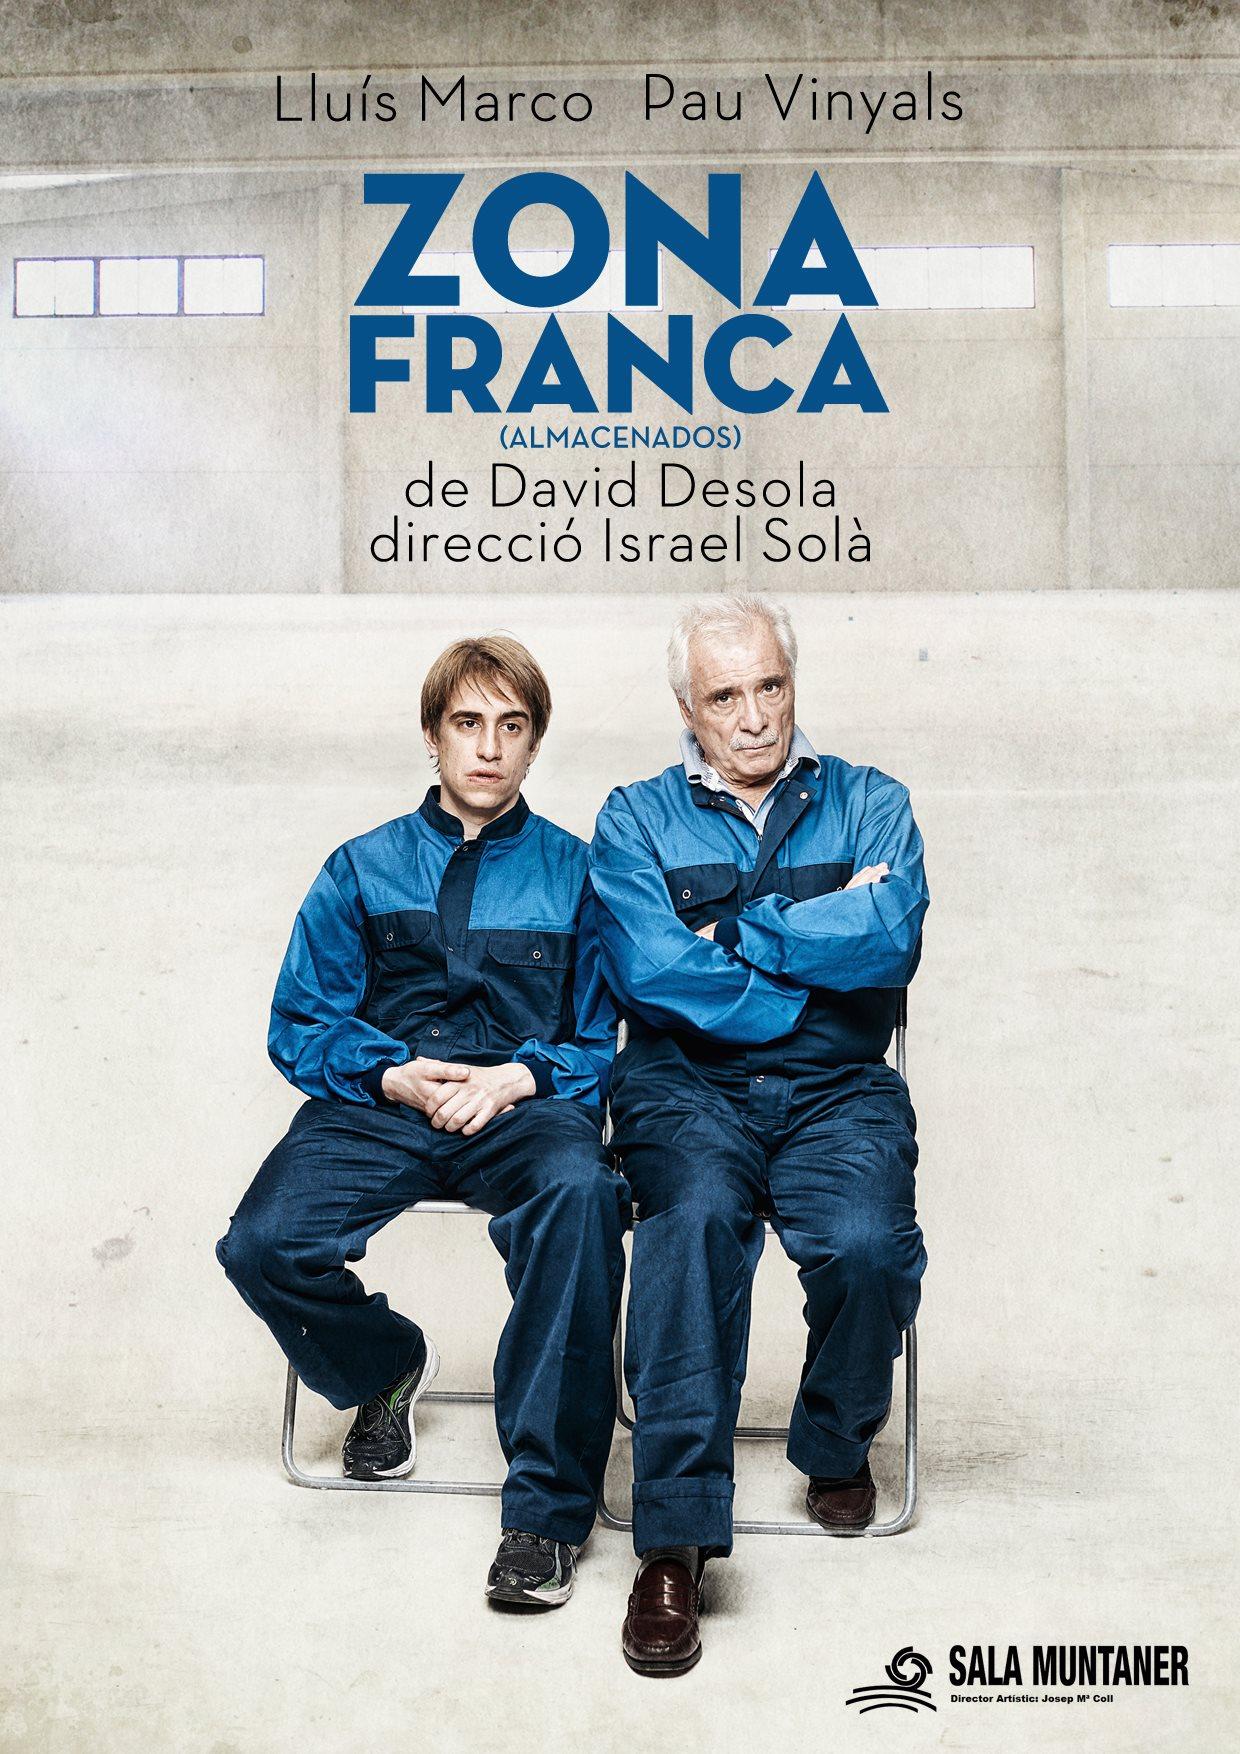 Zona franca teatre barcelona for Cartellera teatre barcelona